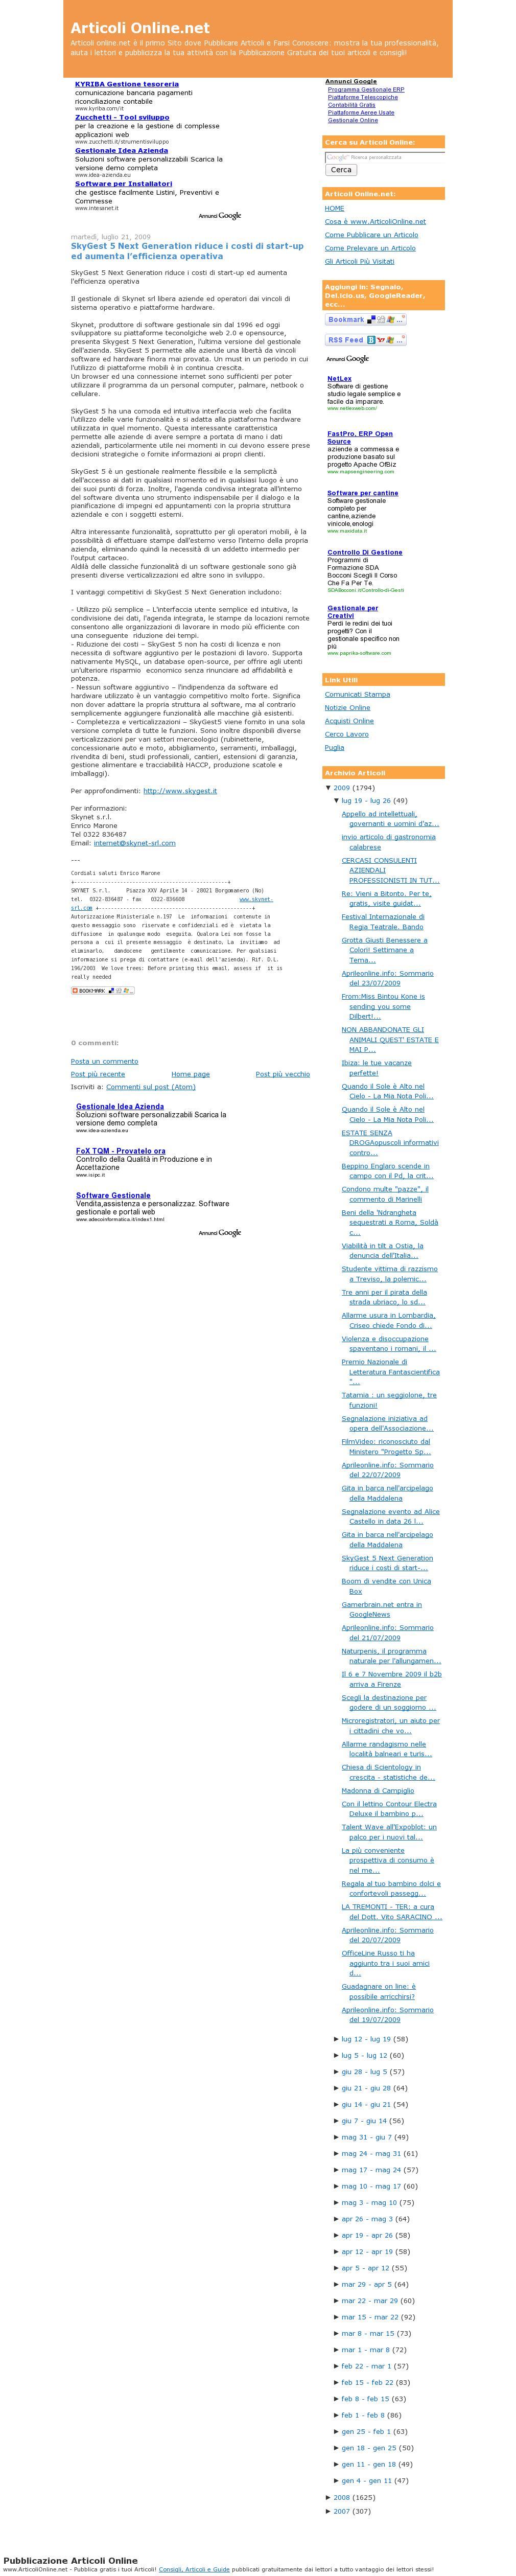 articolionline_net-SkyGest 5 Next Generation riduce i costi di start-up ed aumenta l'efficienza operativa_220709